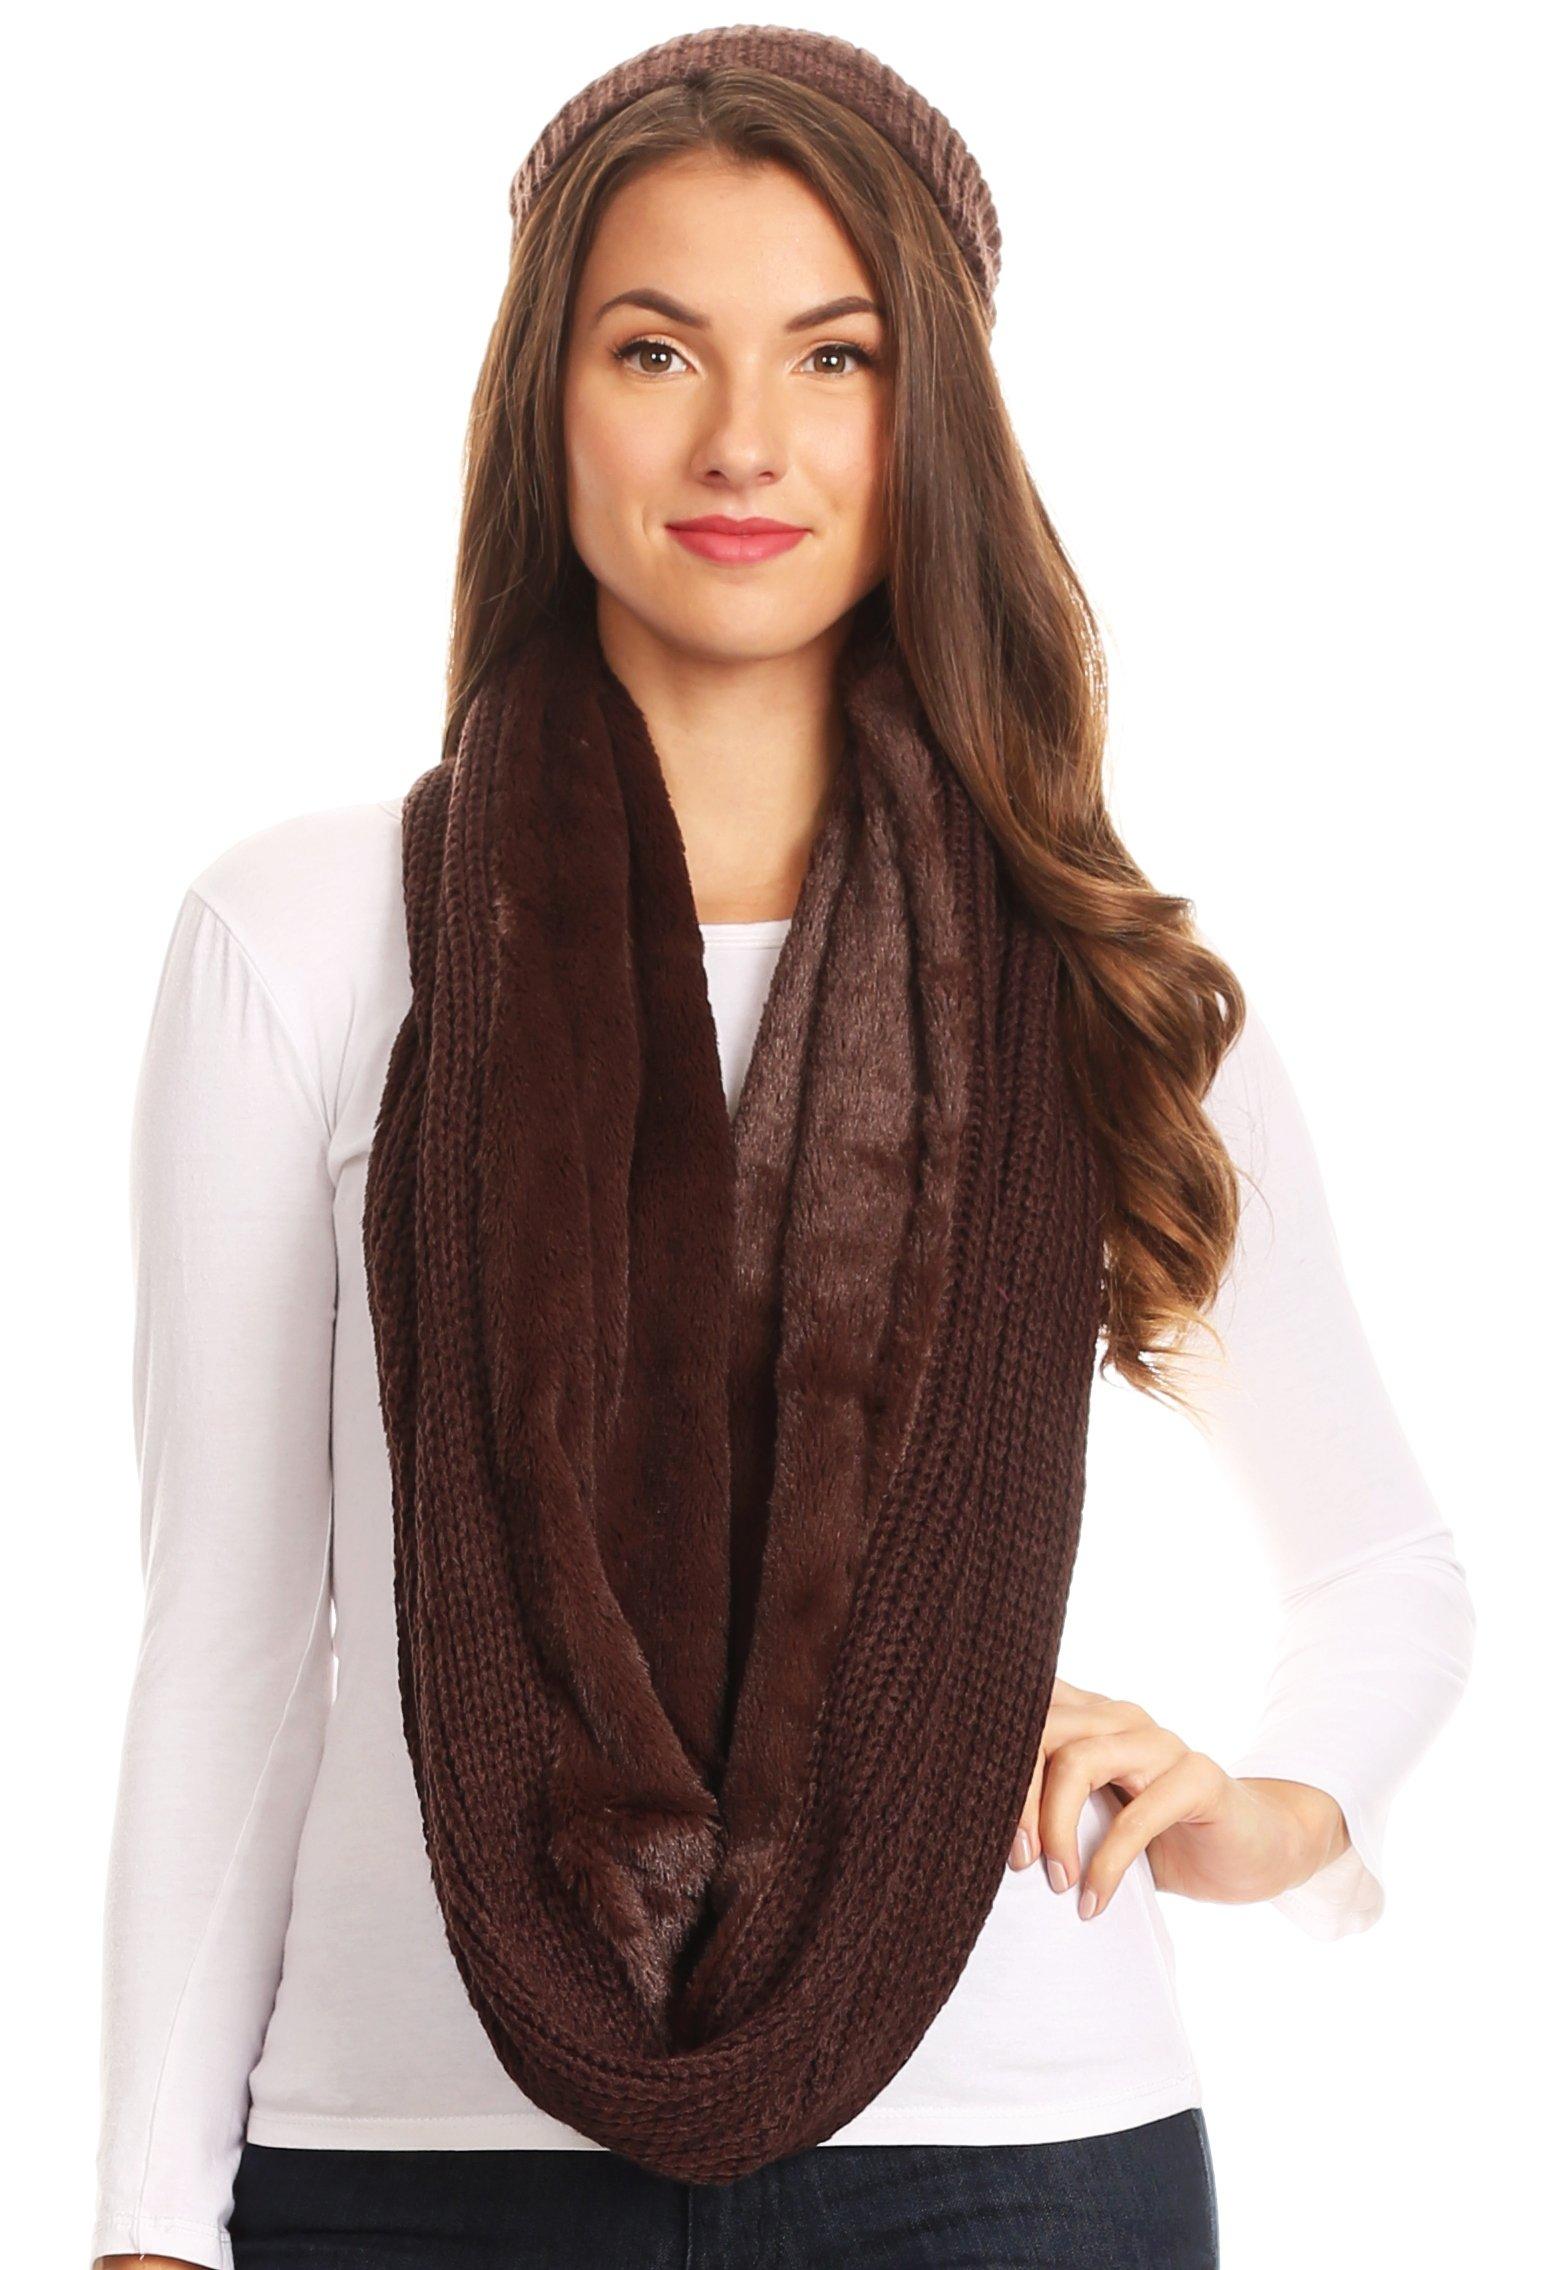 Sakkas 16139 - Balencia Cool Girl Long Wide Soft Fur Lined Infinity Scarf Beanie Hat Set - Chocolate - OS